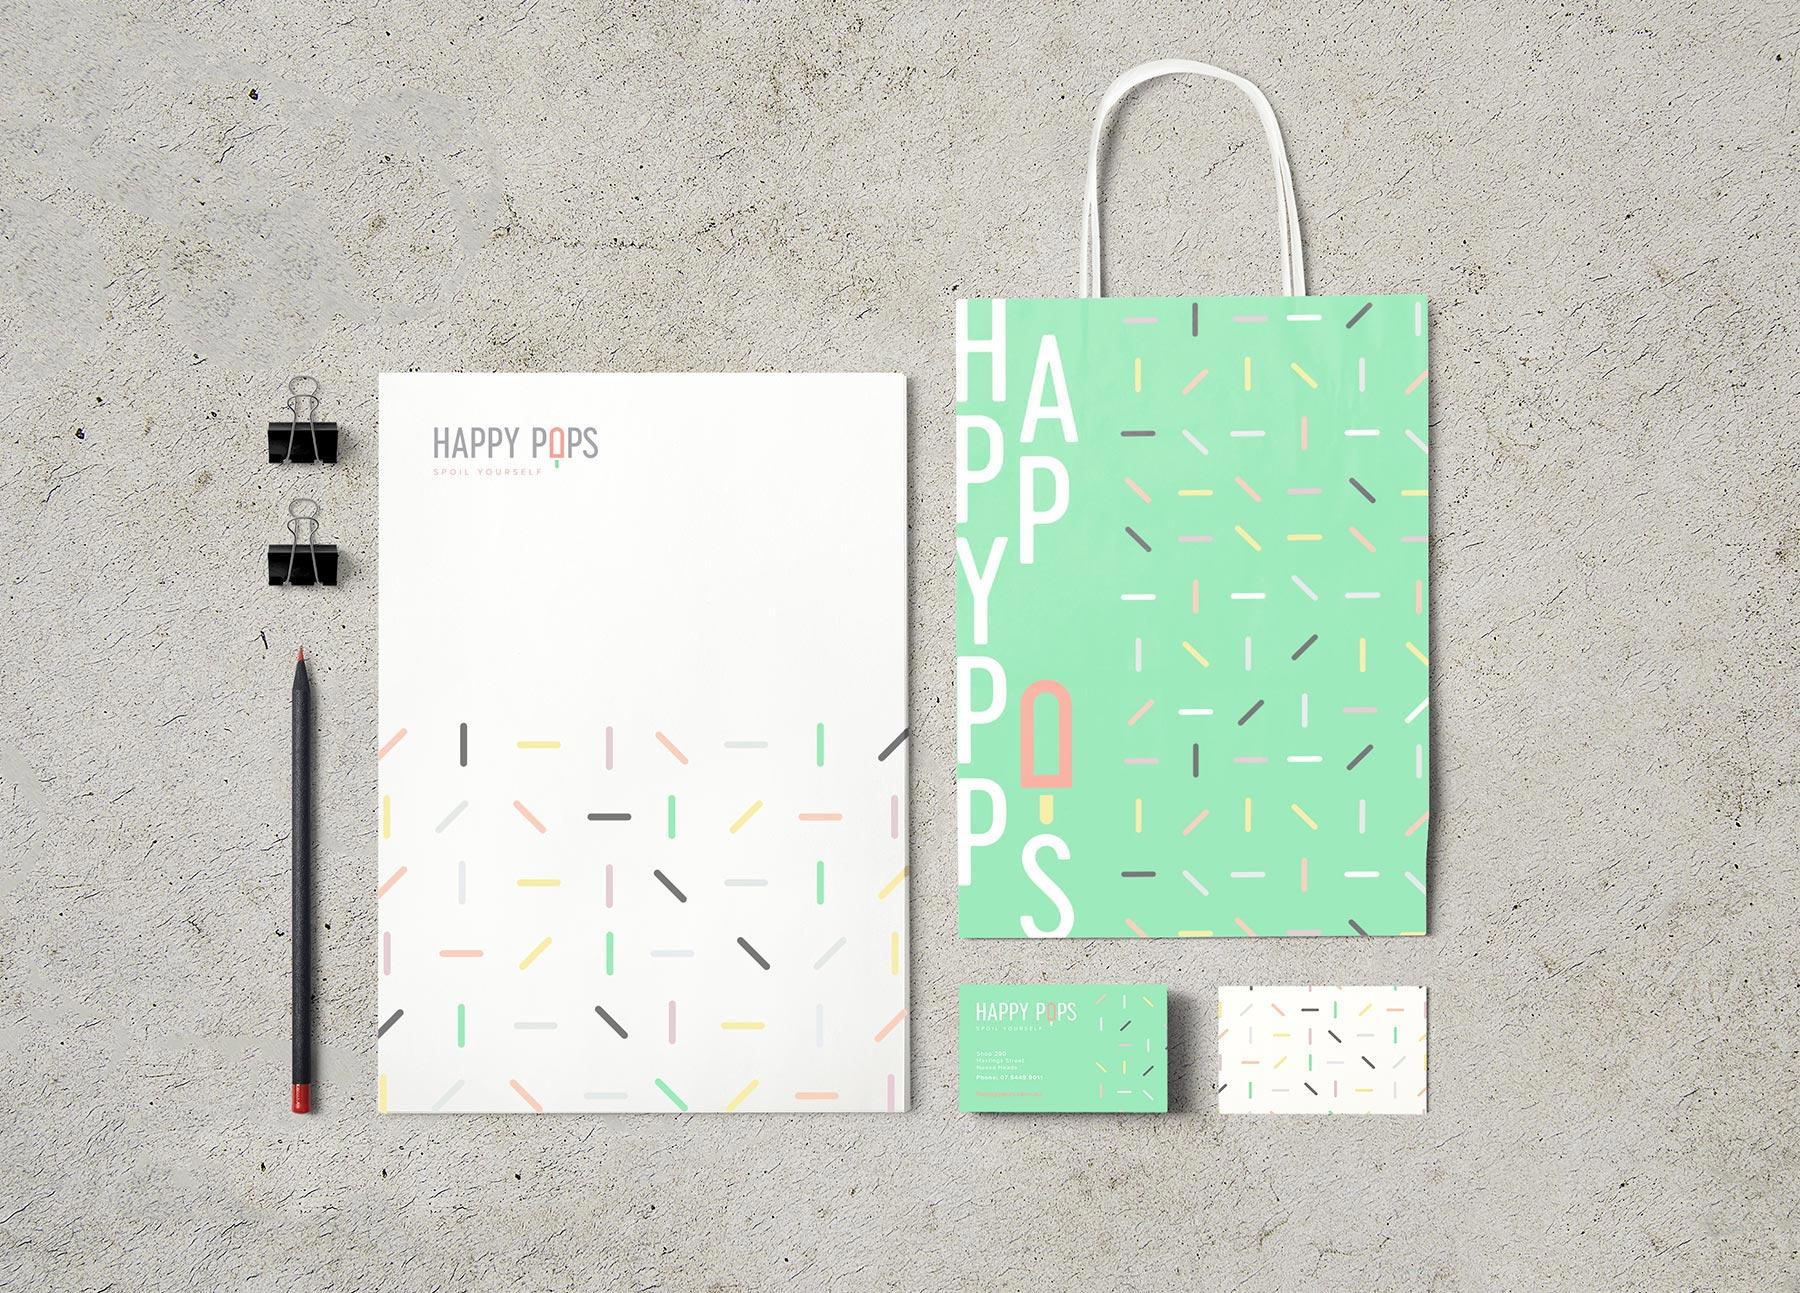 led-by-design-happypops-portfolio2